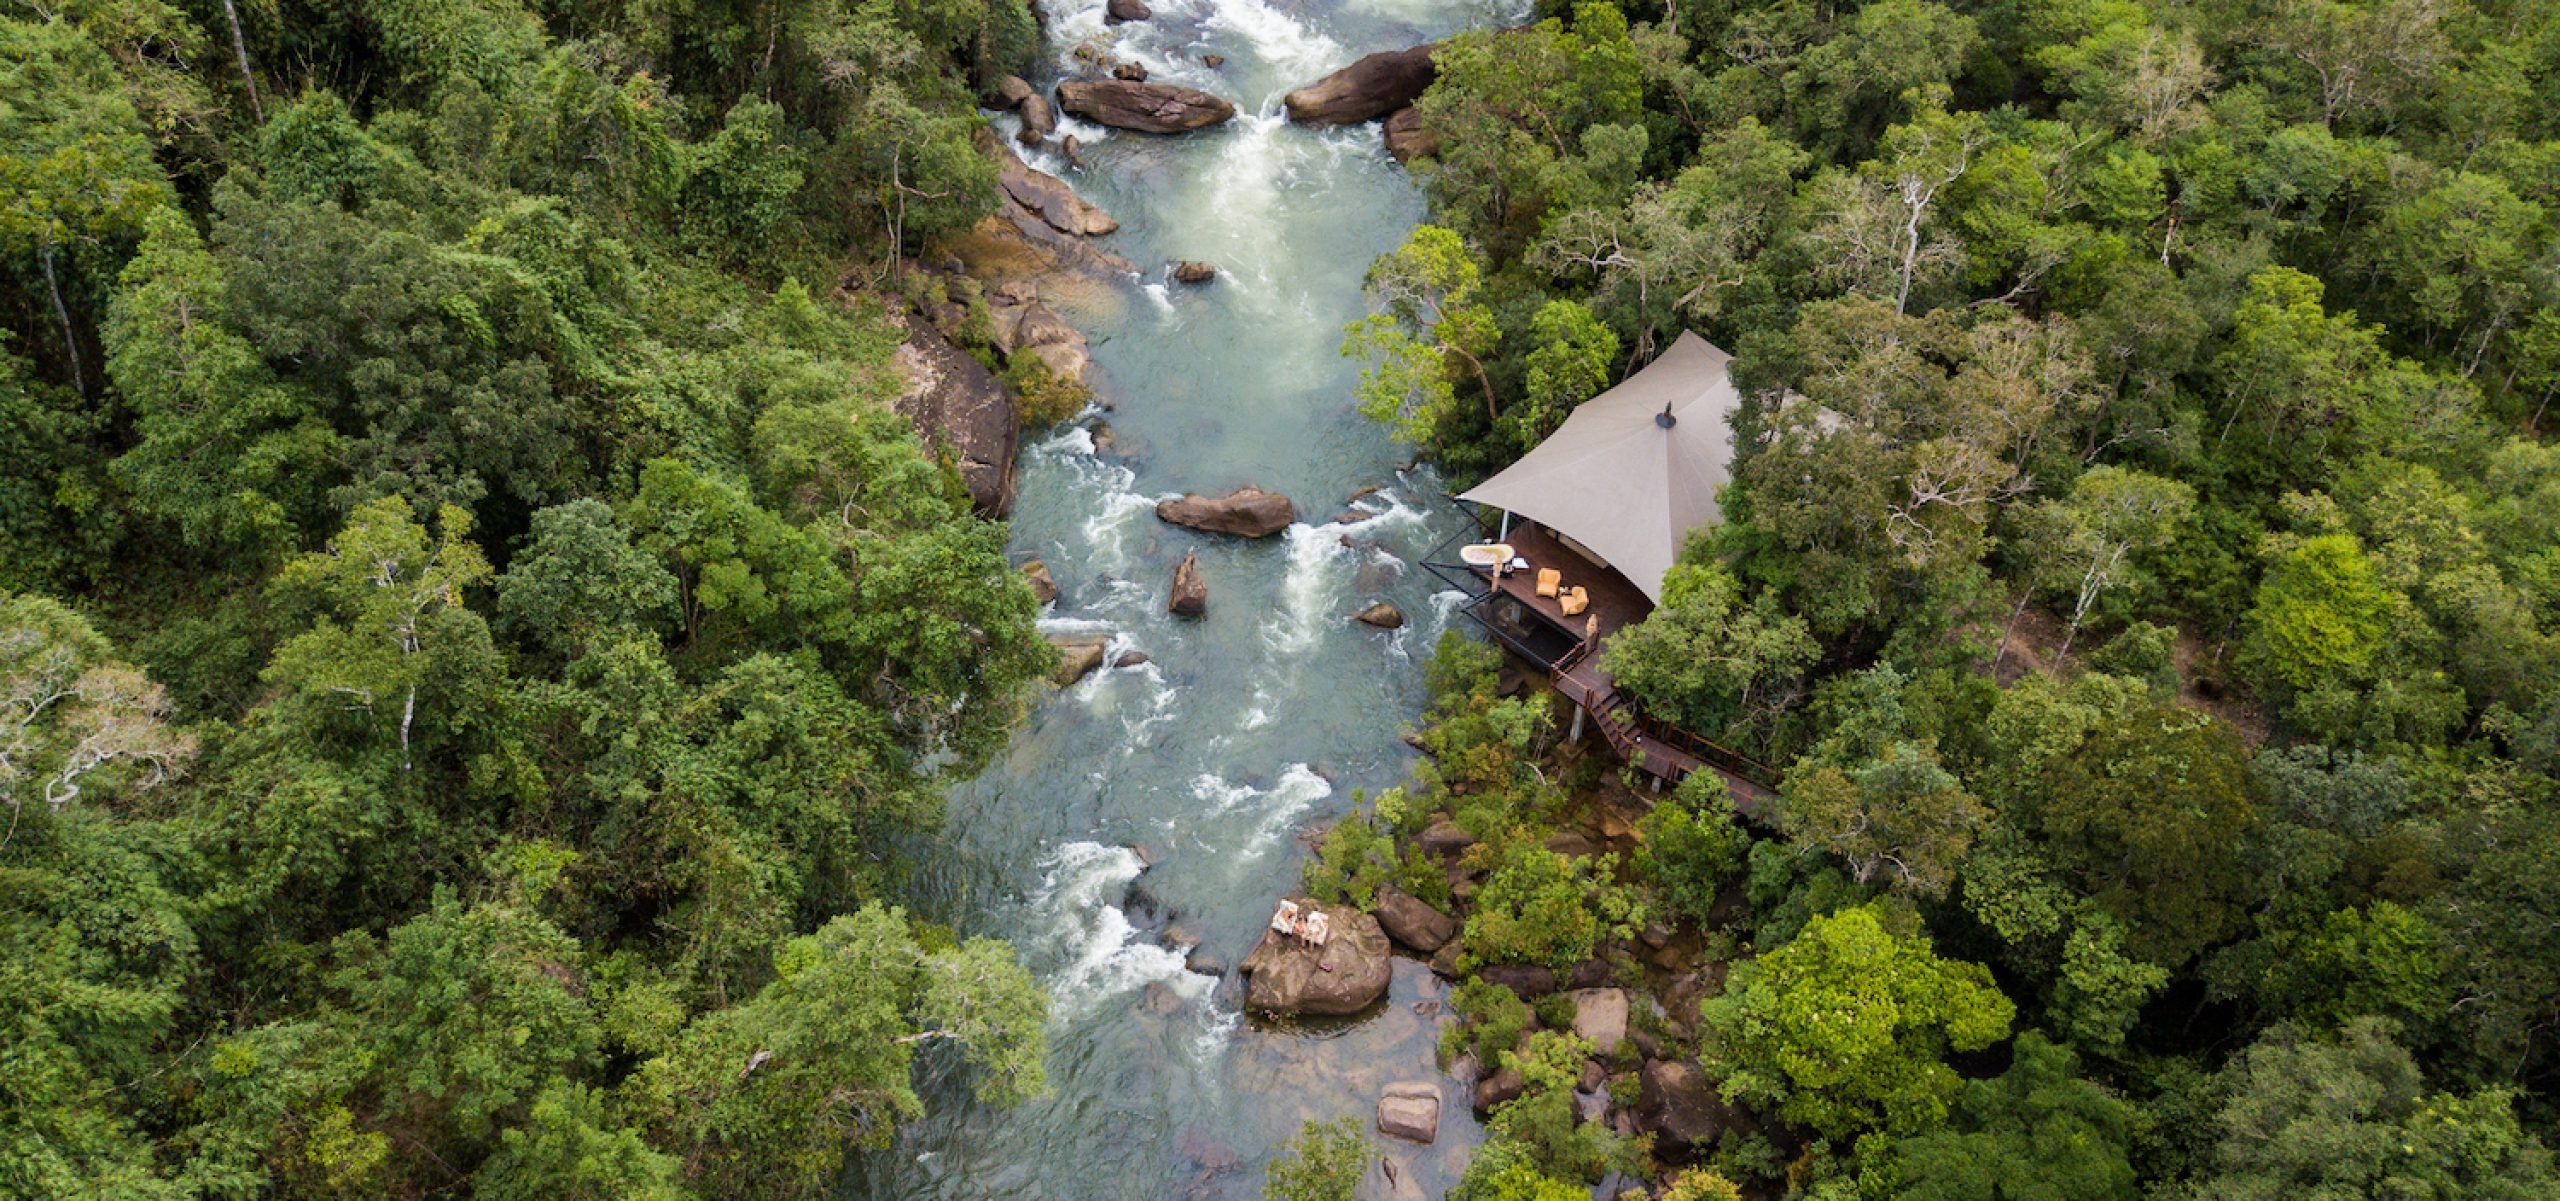 Cambodia - Shinta Mani Wild